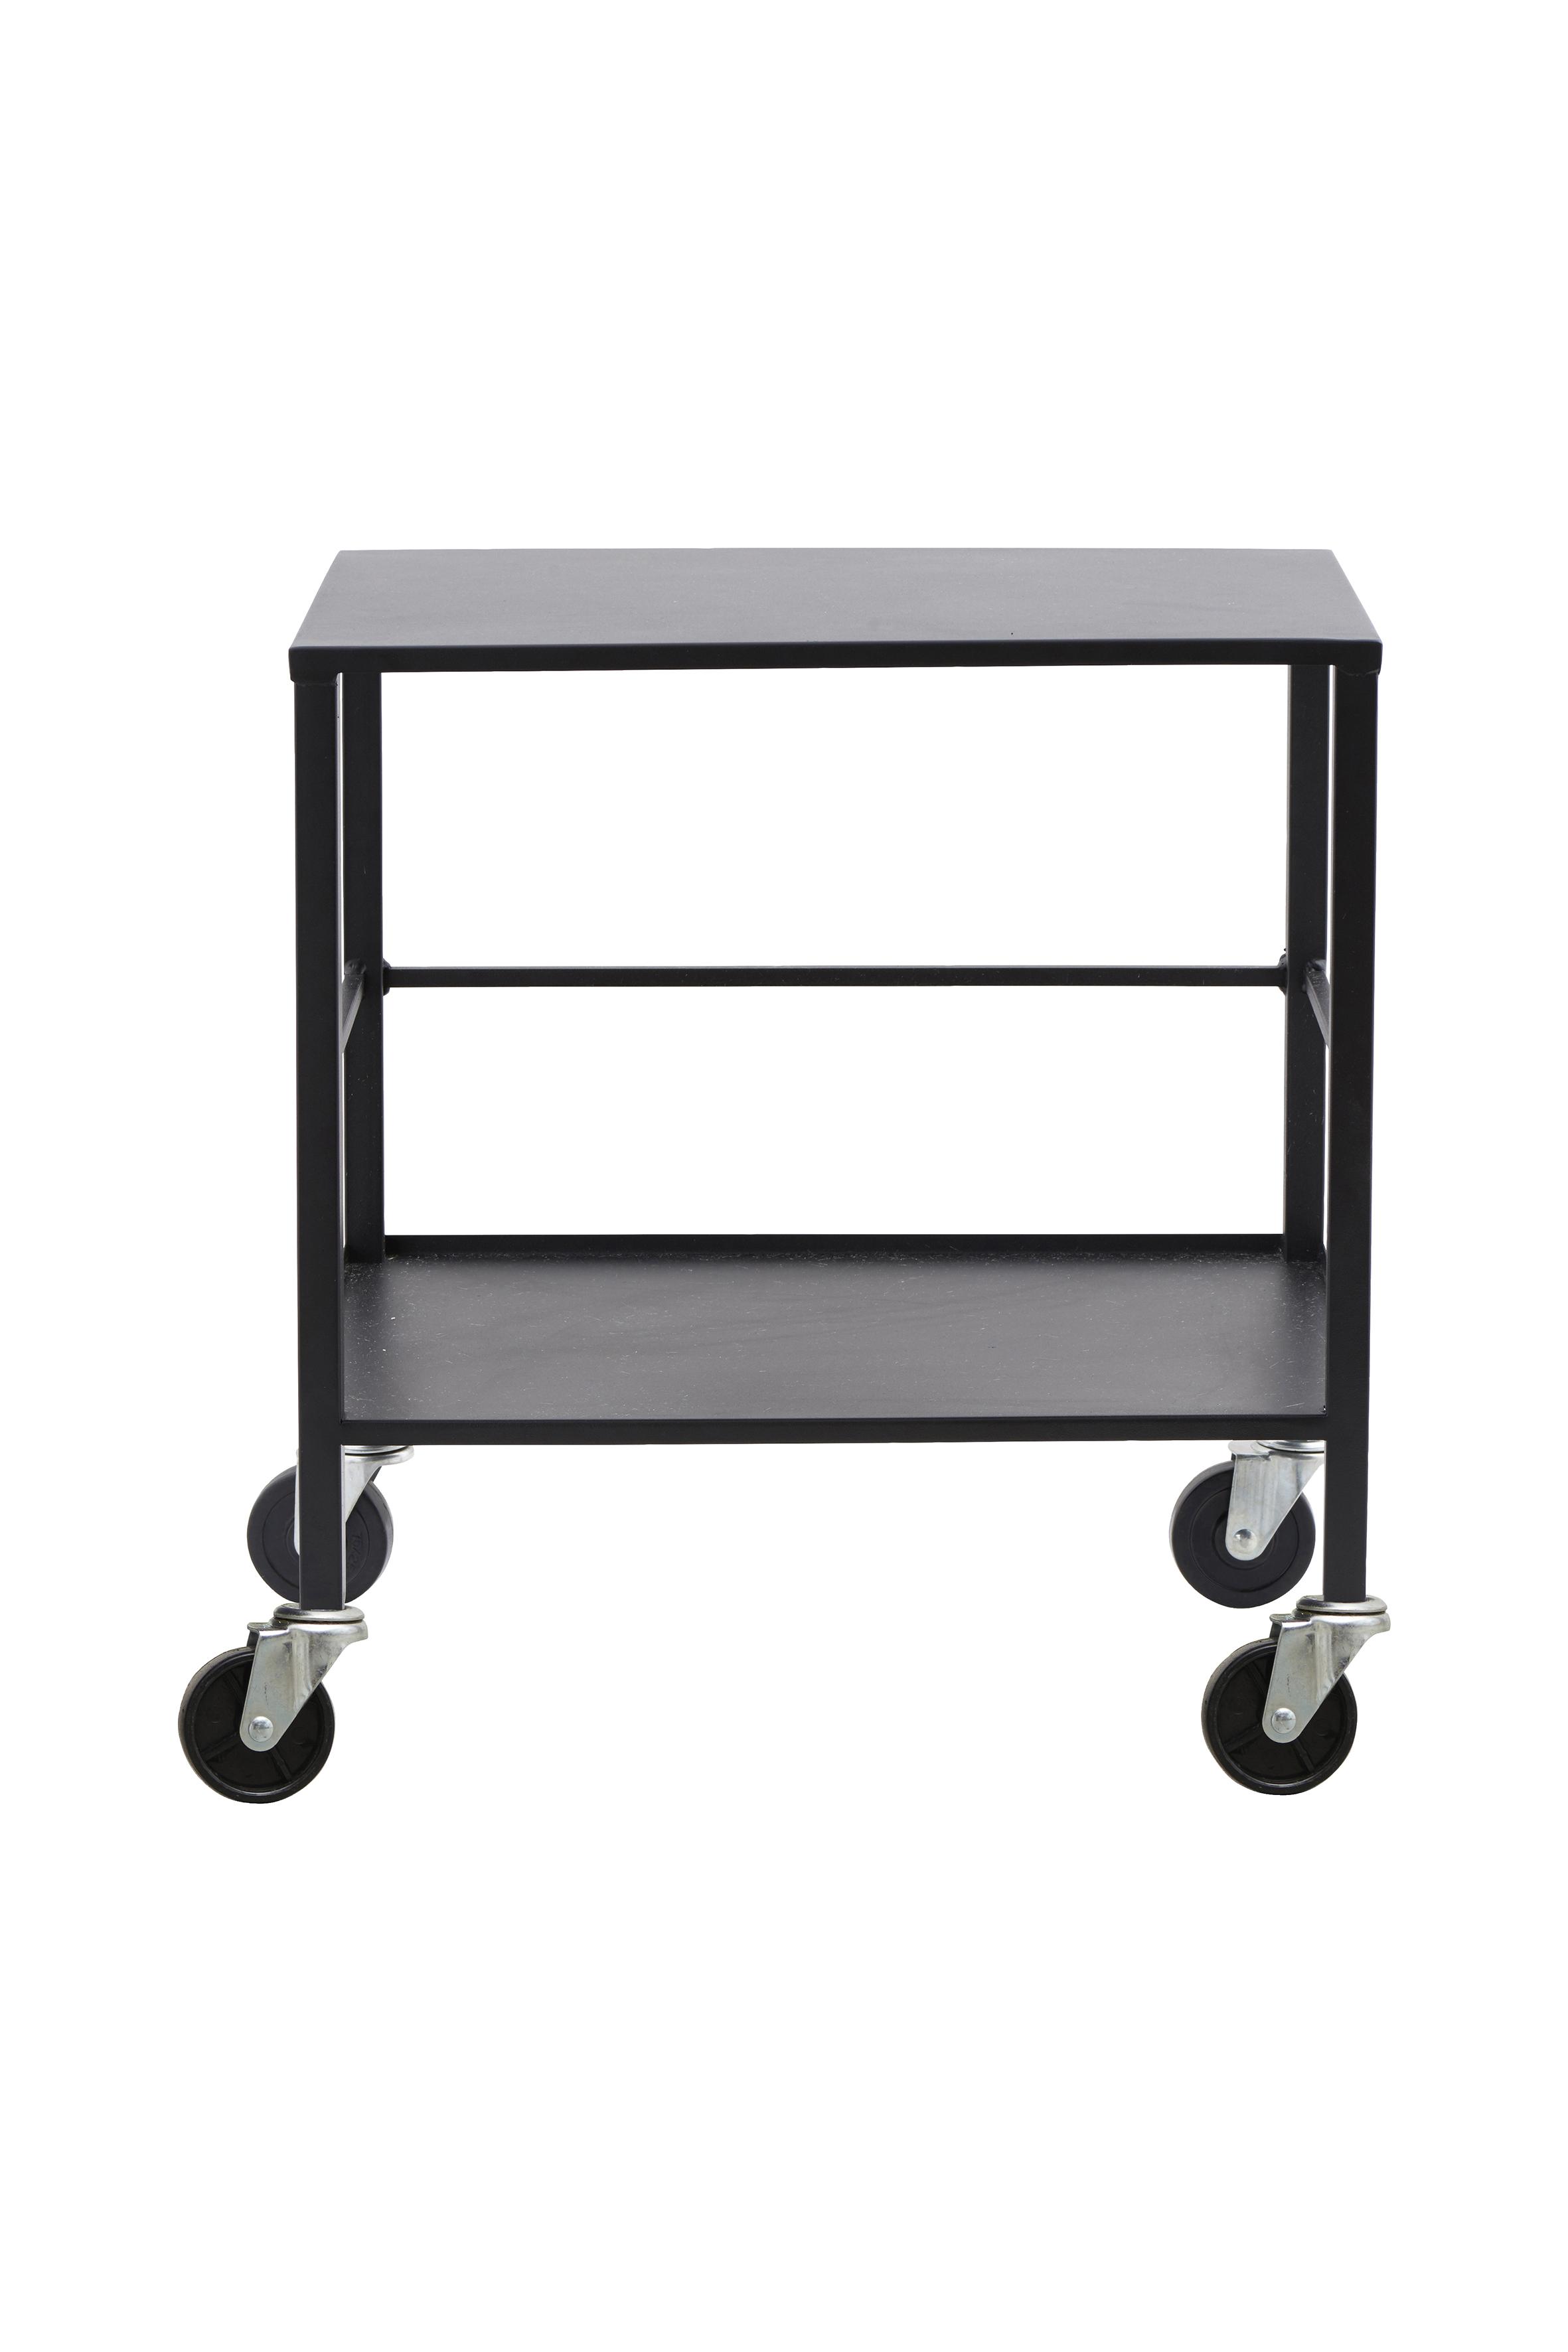 HOUSE DOCTOR Office trolley - gr metal, 2 hylder, (55x35cm)